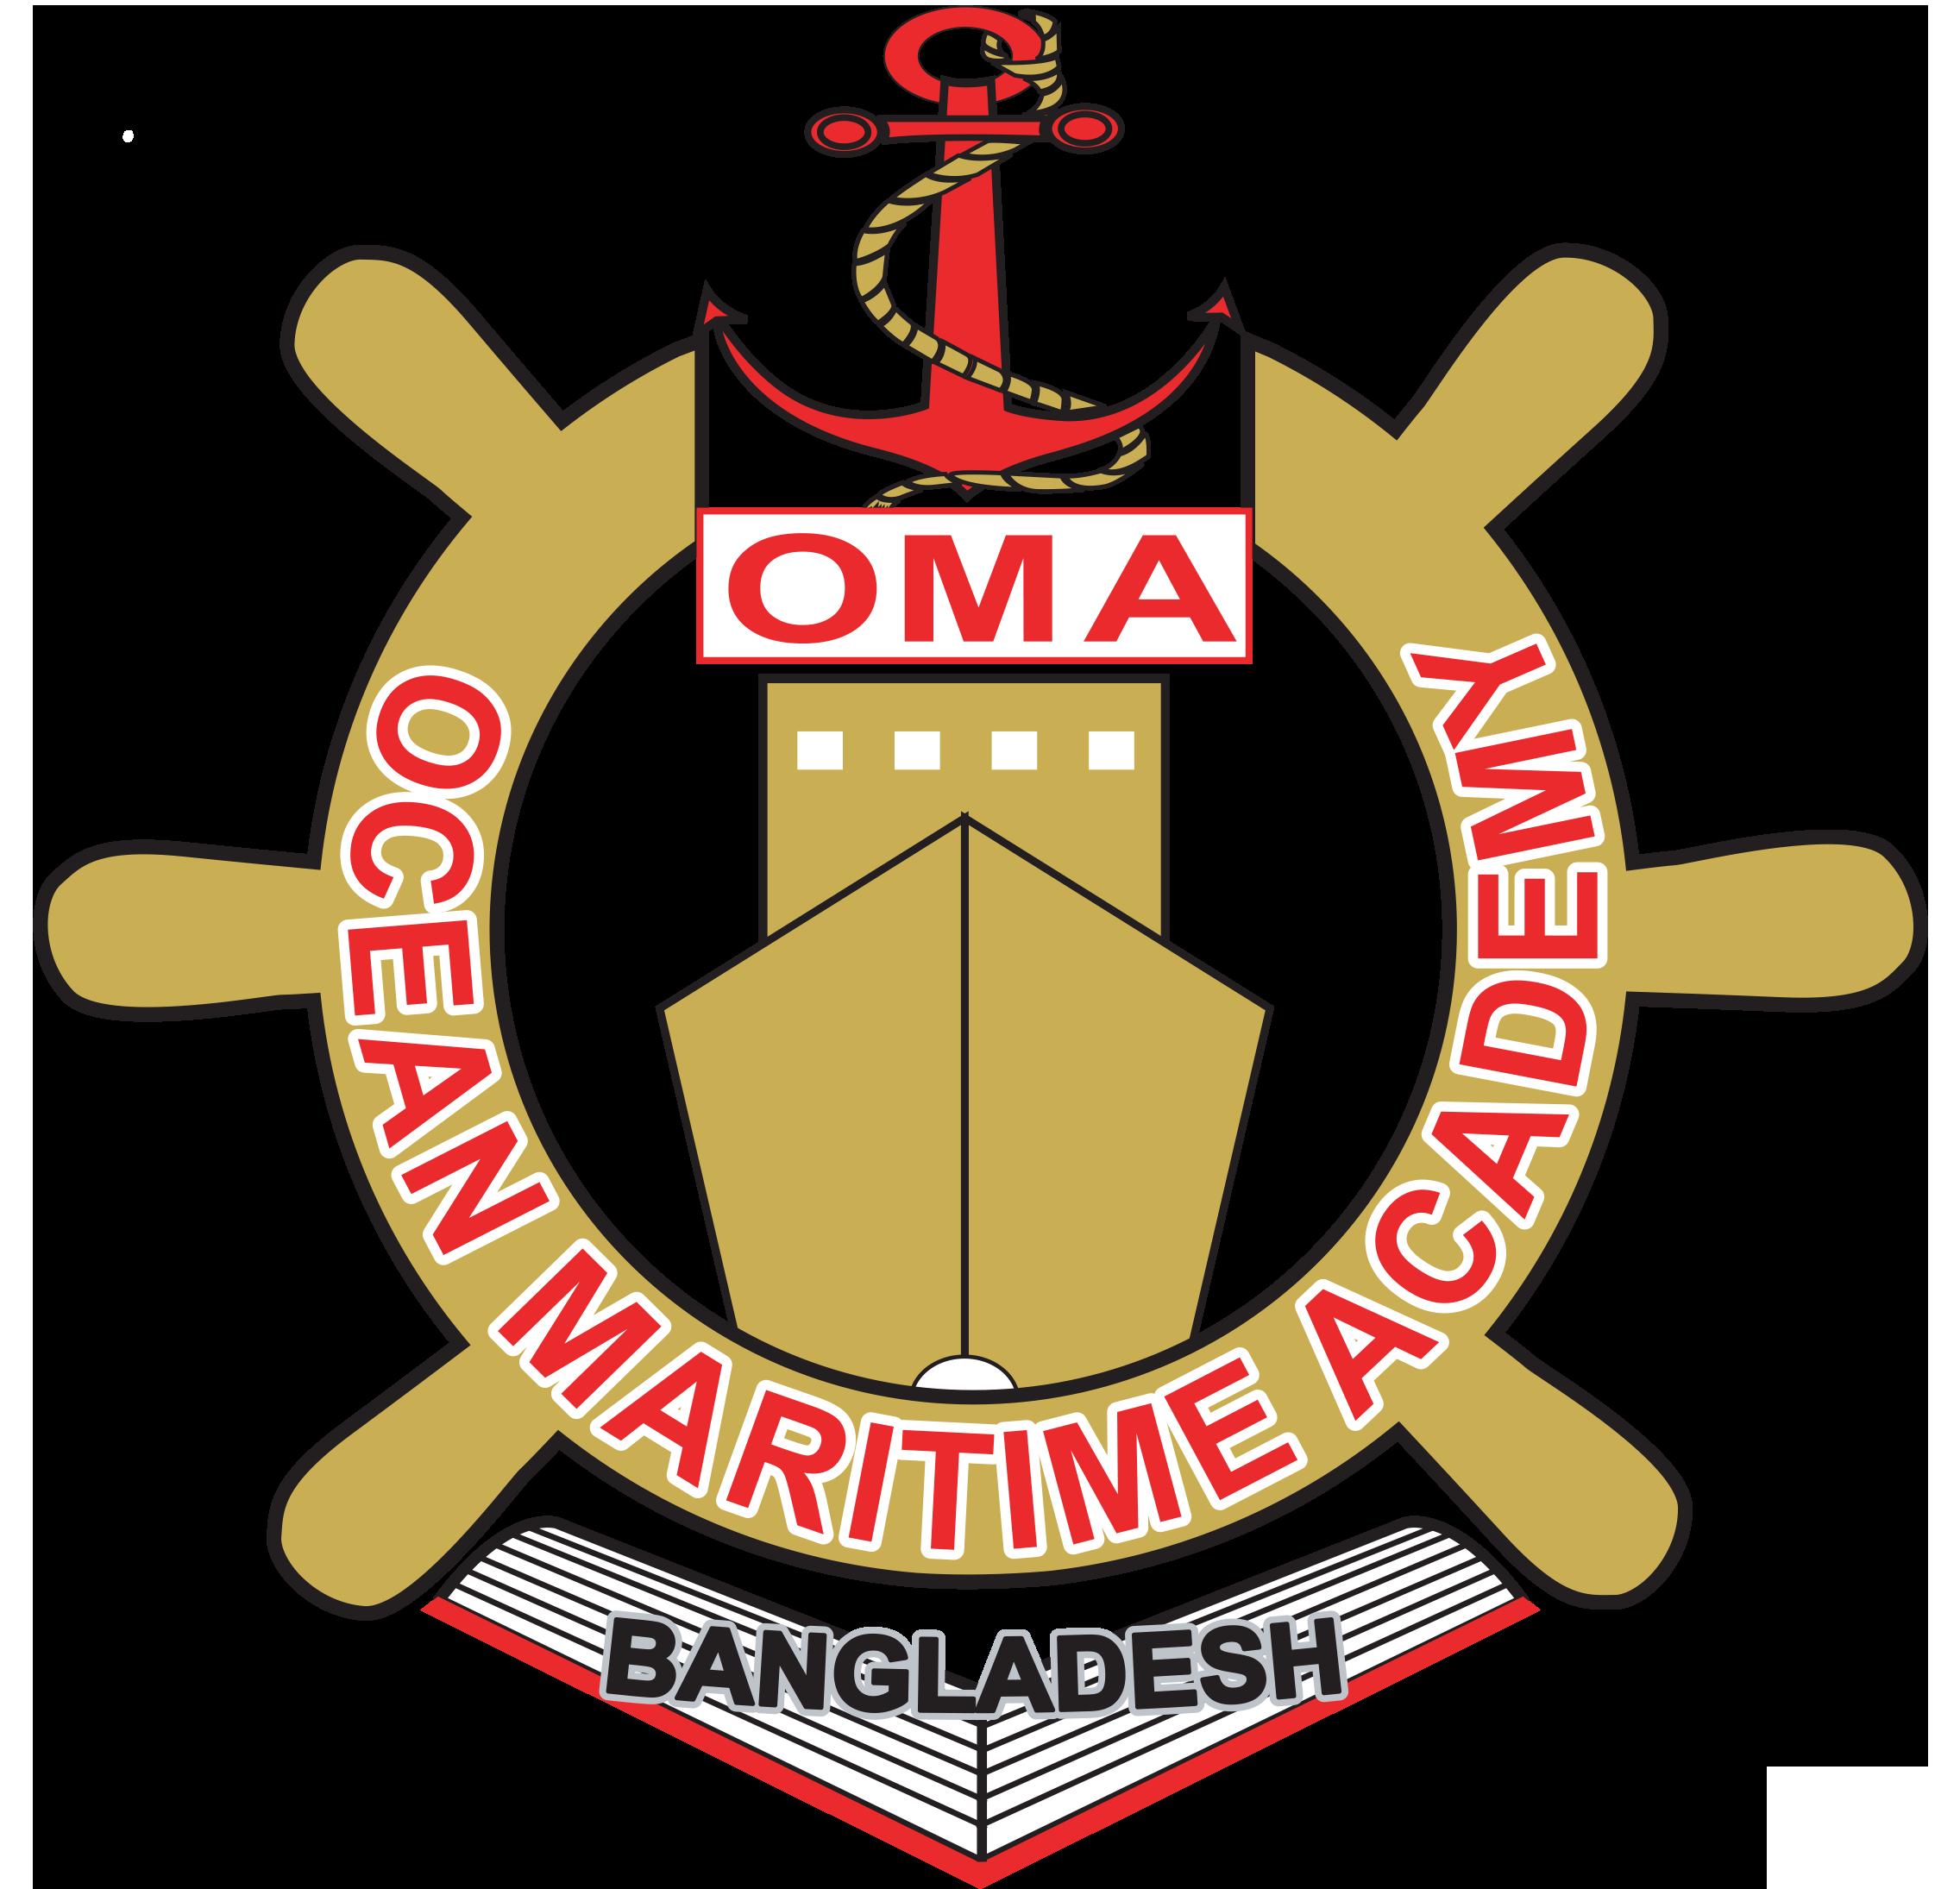 Ocean Maritime Academy